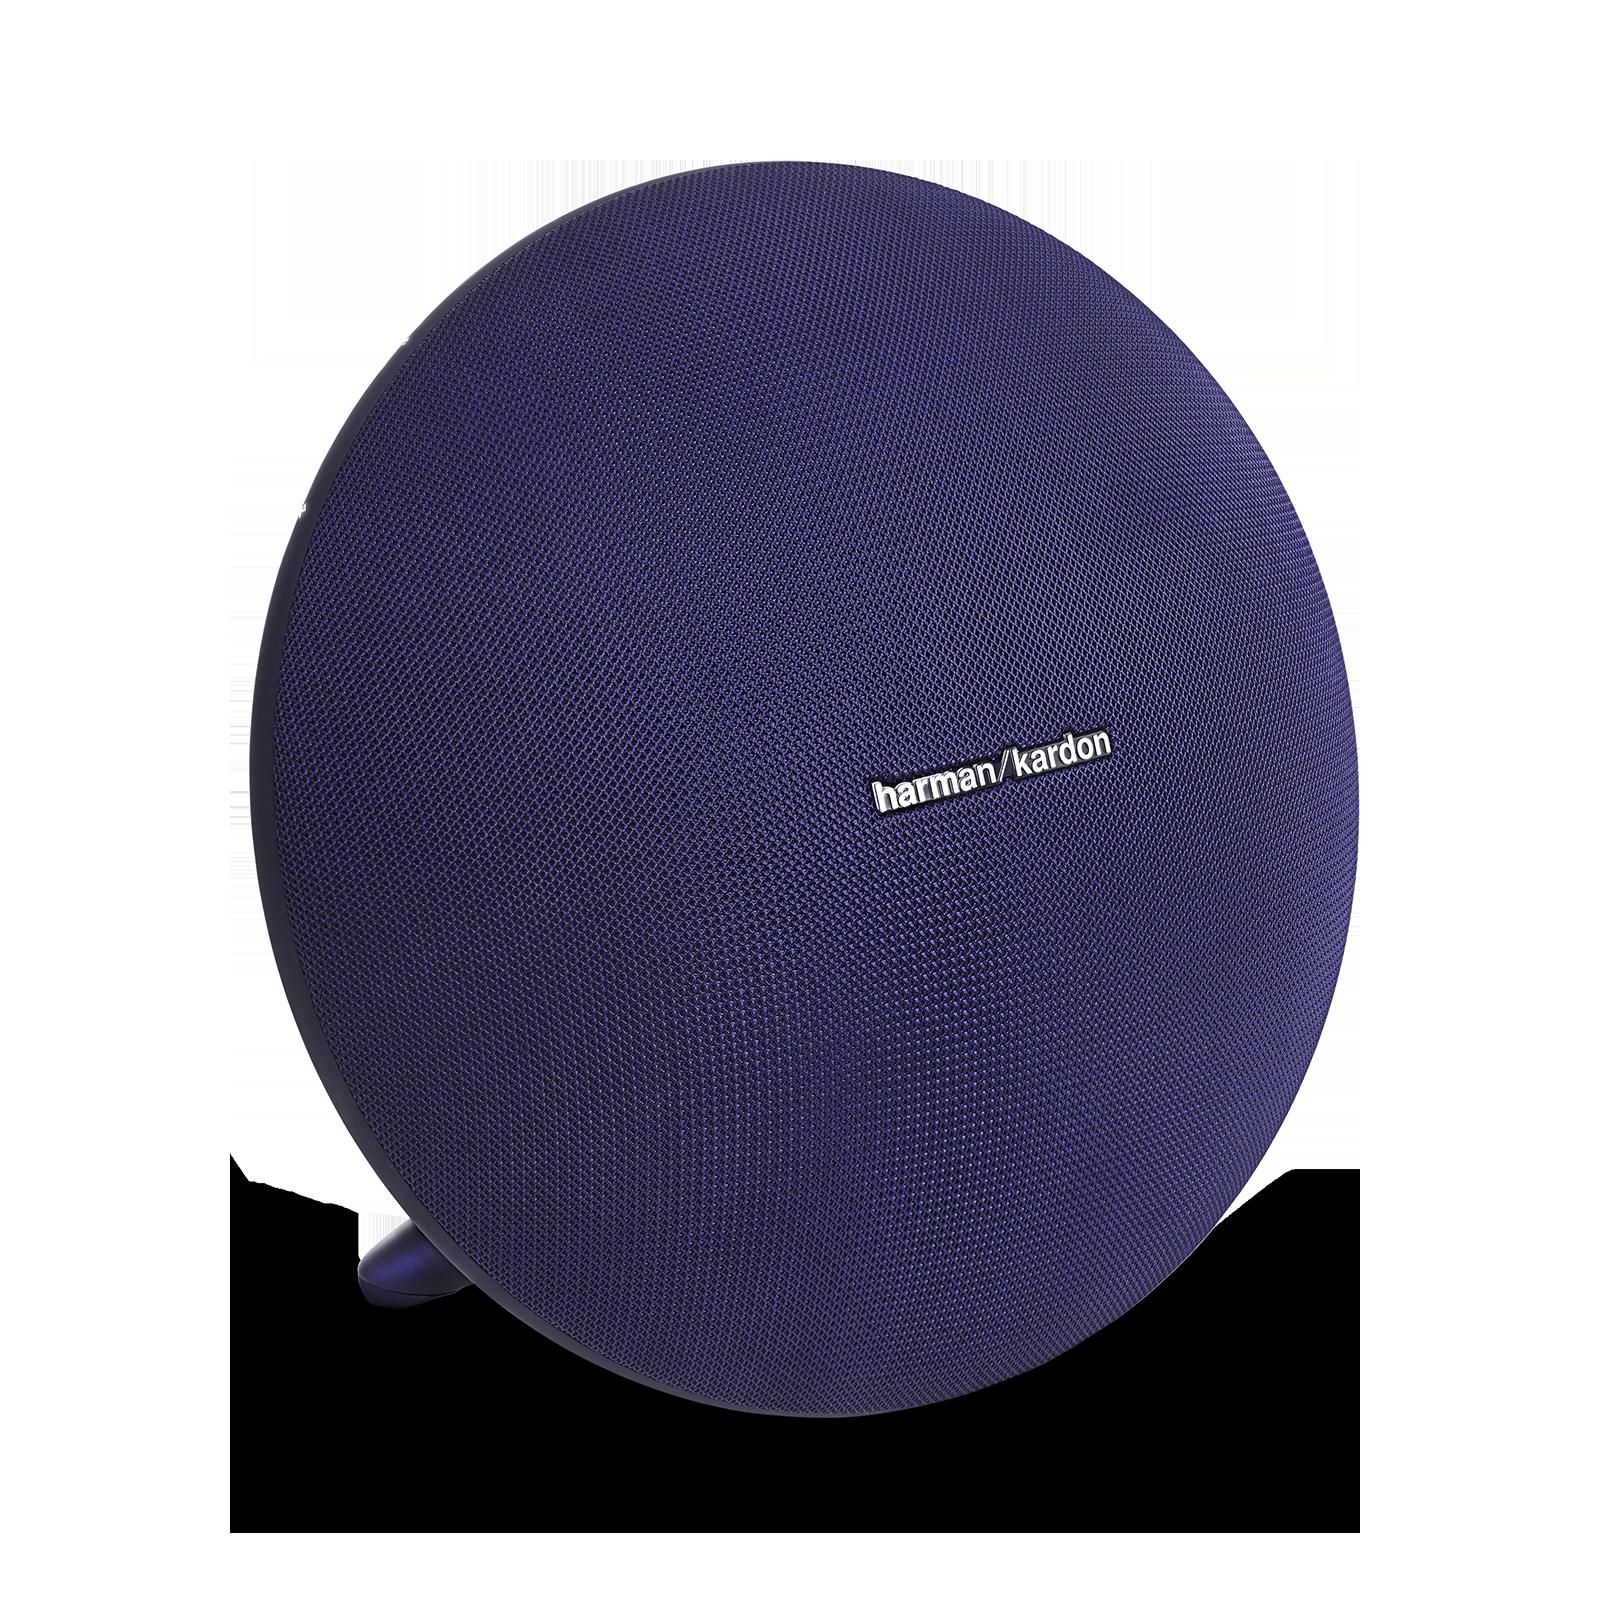 Onyx Studio 3 - Blue - Portable Bluetooth Speaker - Hero